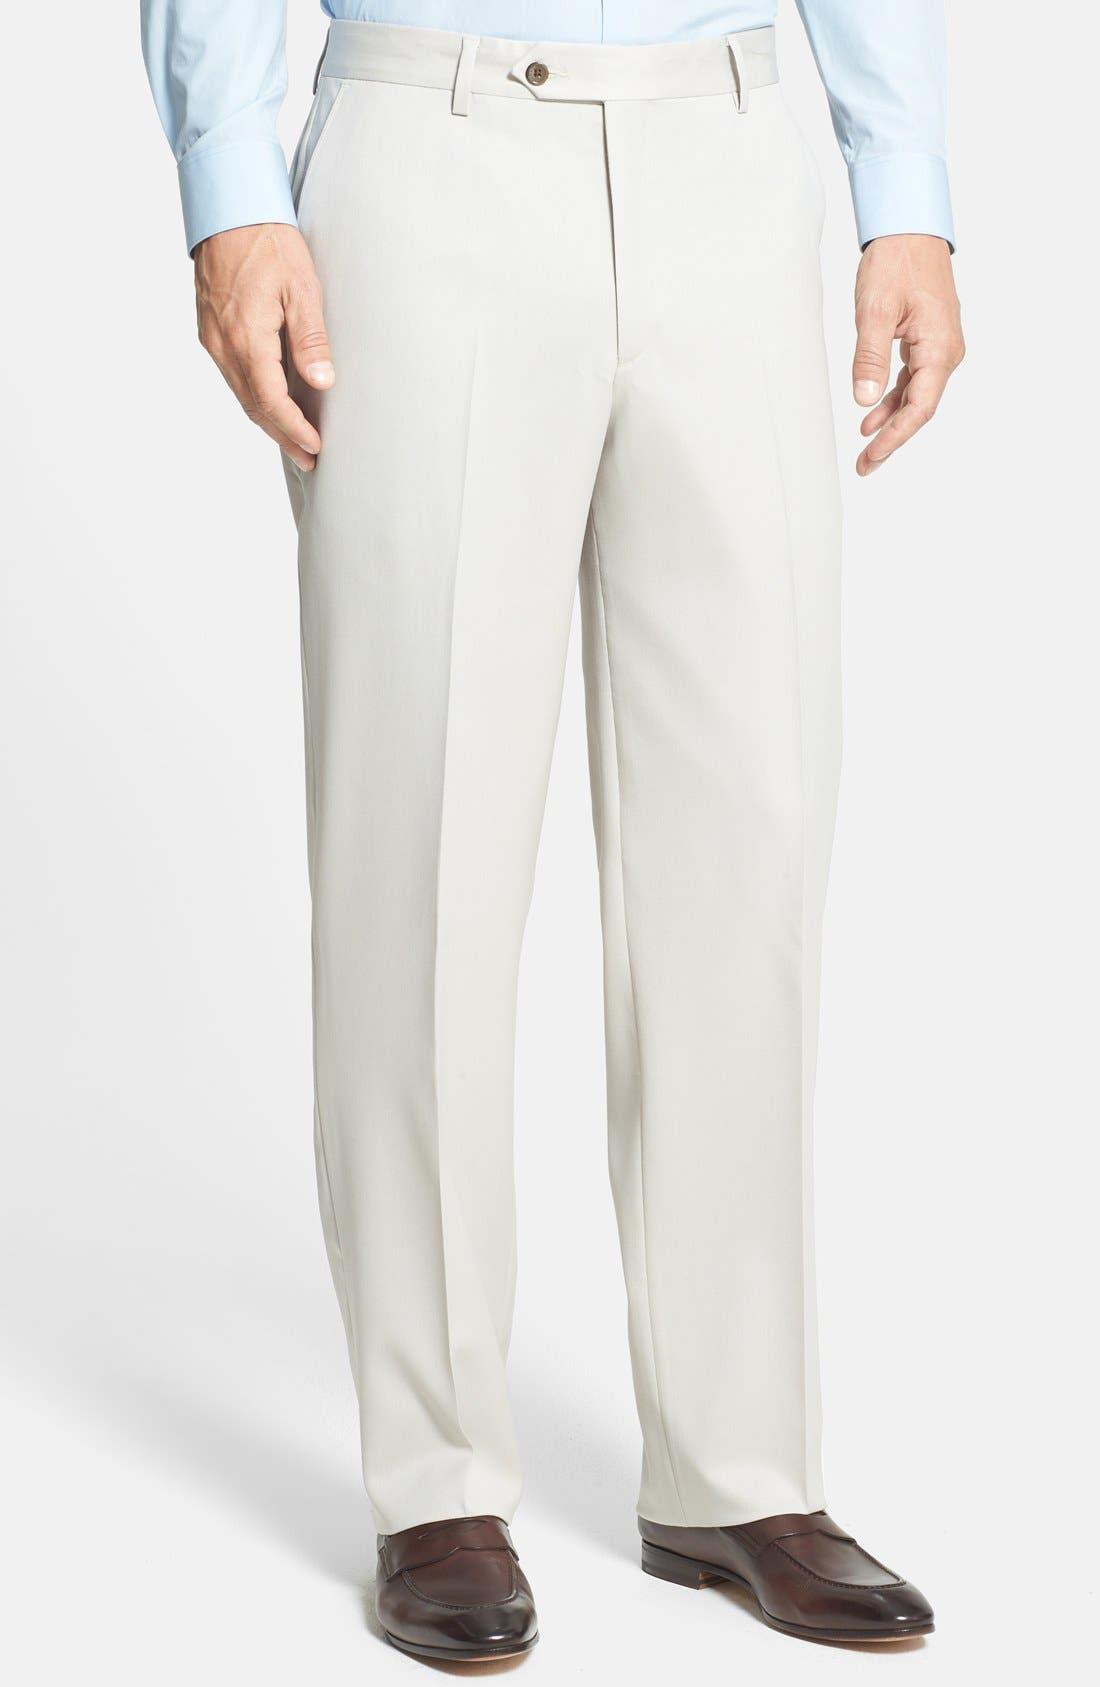 BERLE Flat Front Wool Gabardine Trousers, Main, color, STONE